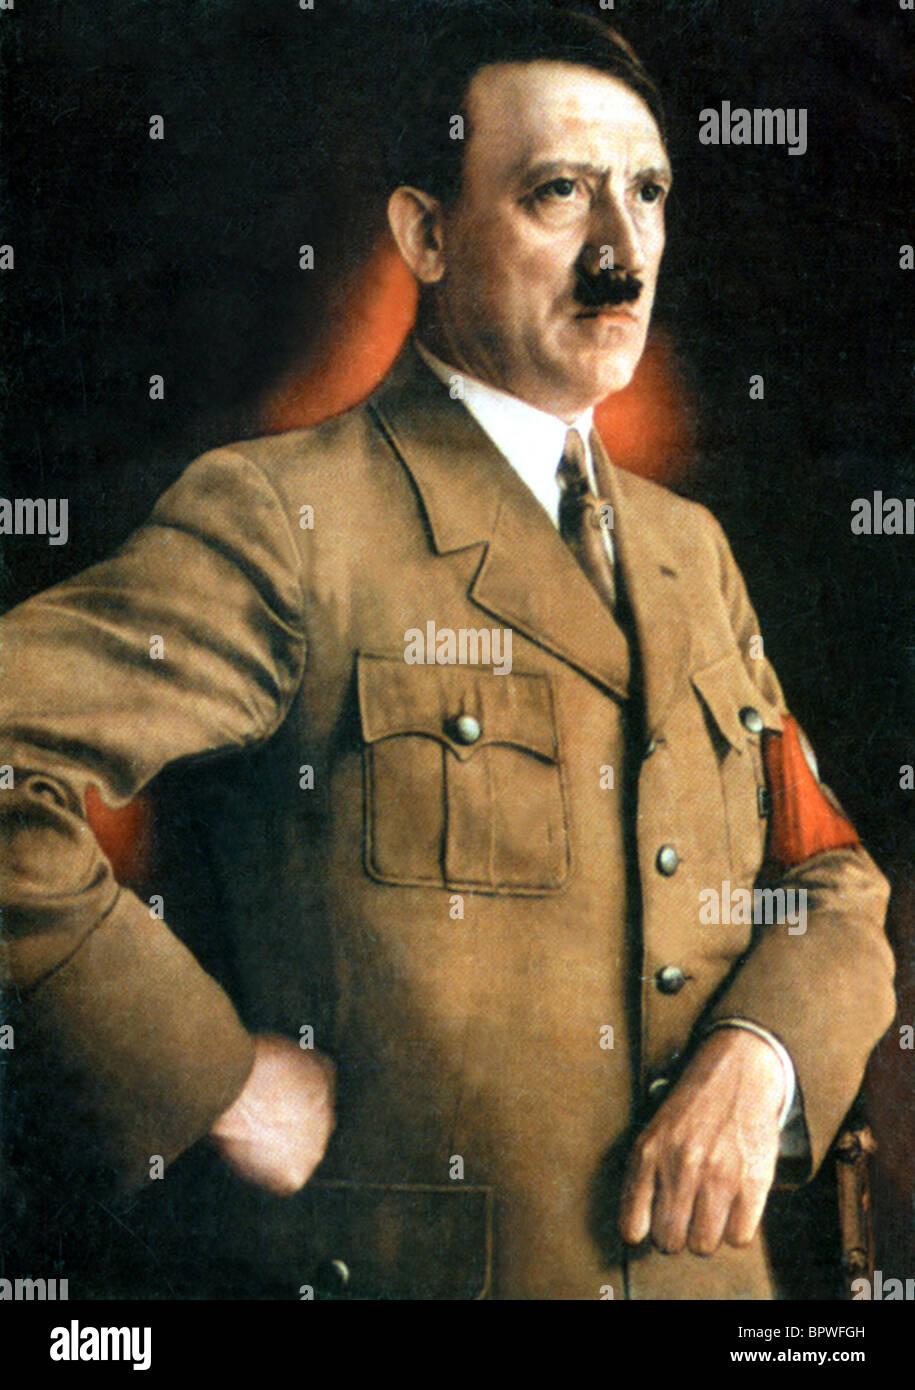 ADOLF HITLER NAZI LEADER 17 December 1942 - Stock Image